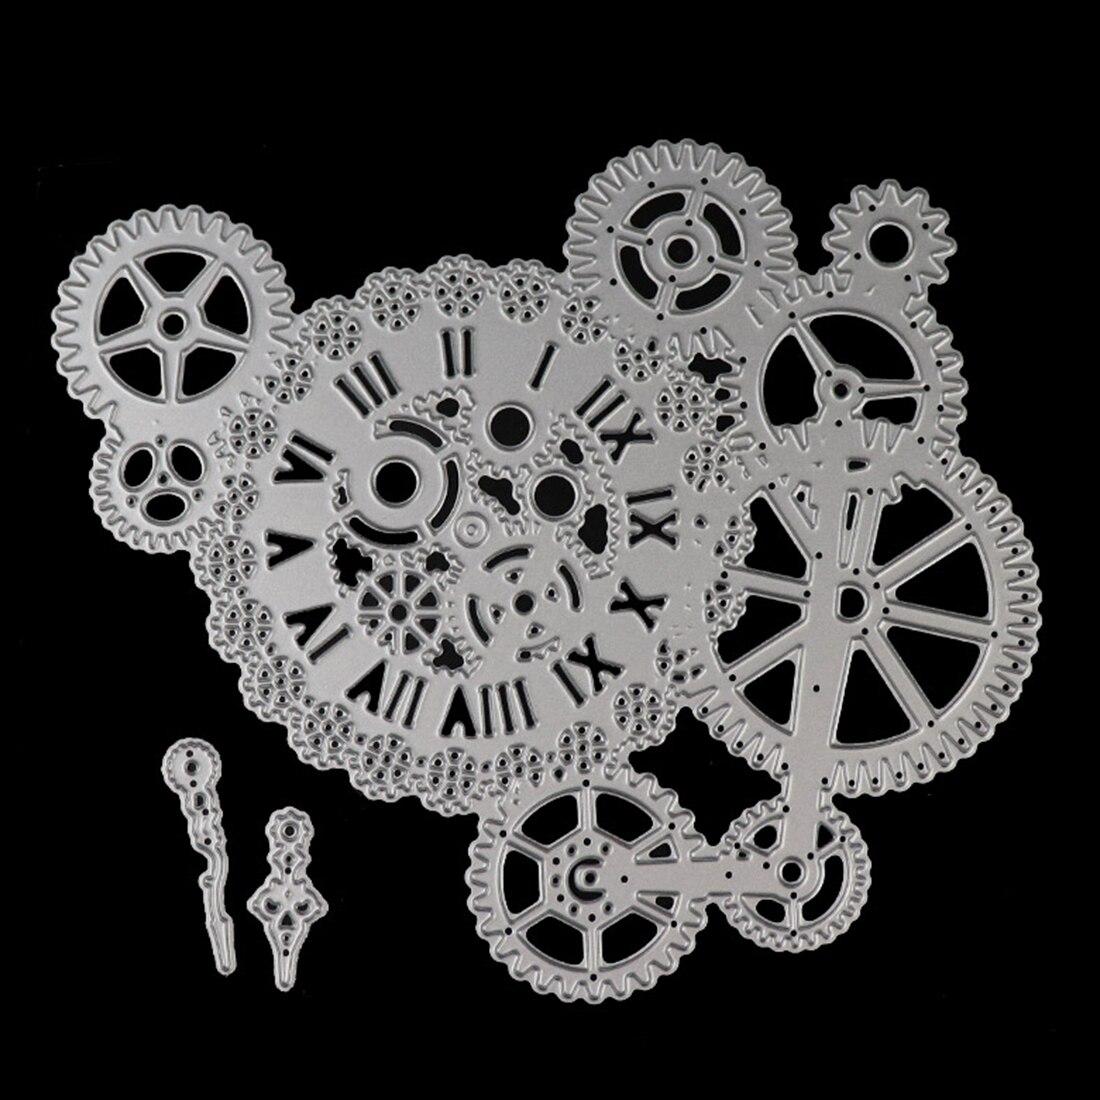 Gear Cutting Dies Frame Background Craft Metal Cutting Cut Scrapbooking Die DIY